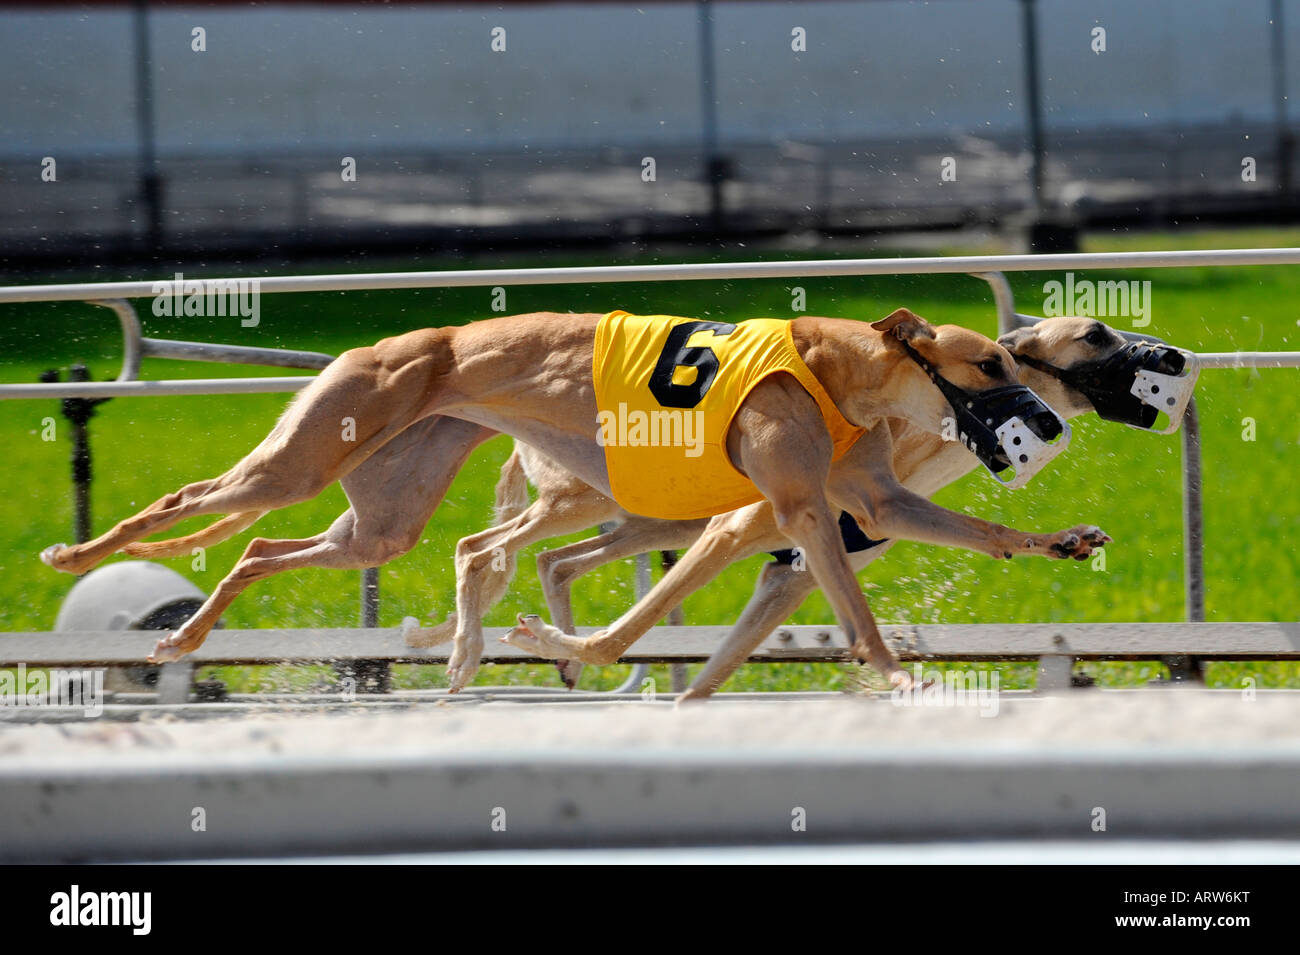 Greyhound dog racing at Fort Myers Naples dog track Florida Stock Photo